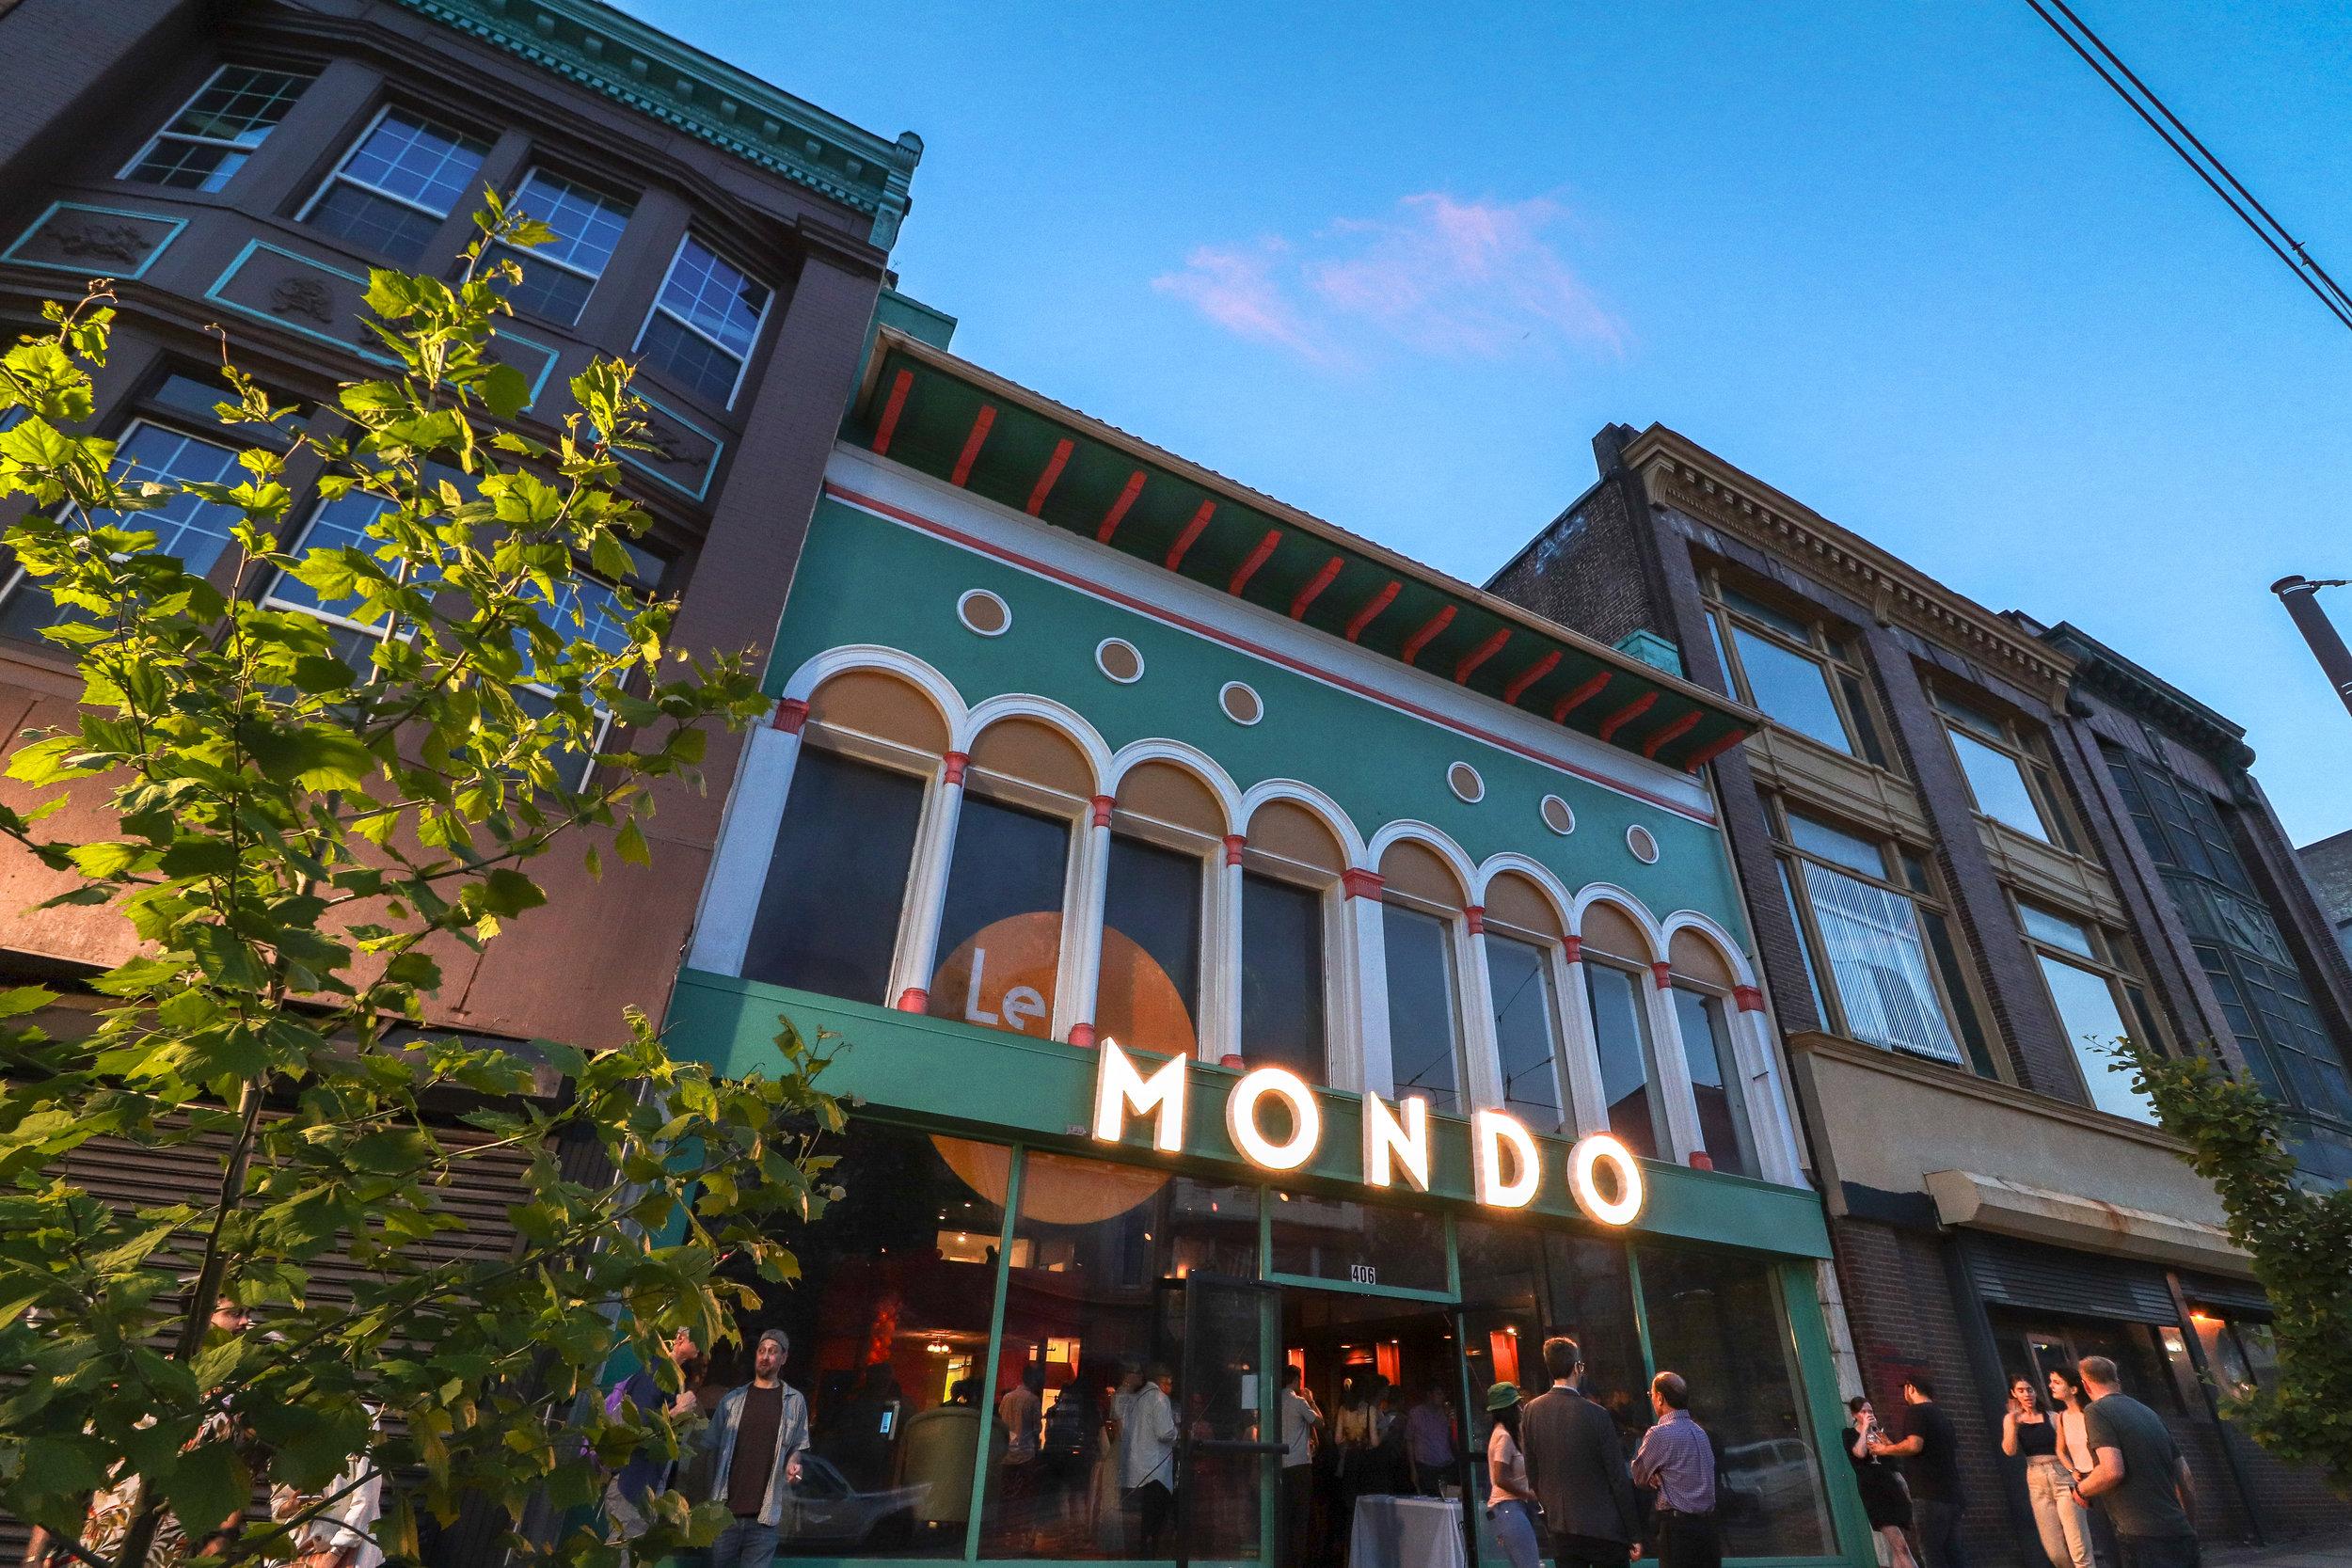 Le Mondo Opening RKK (7 of 7).jpg